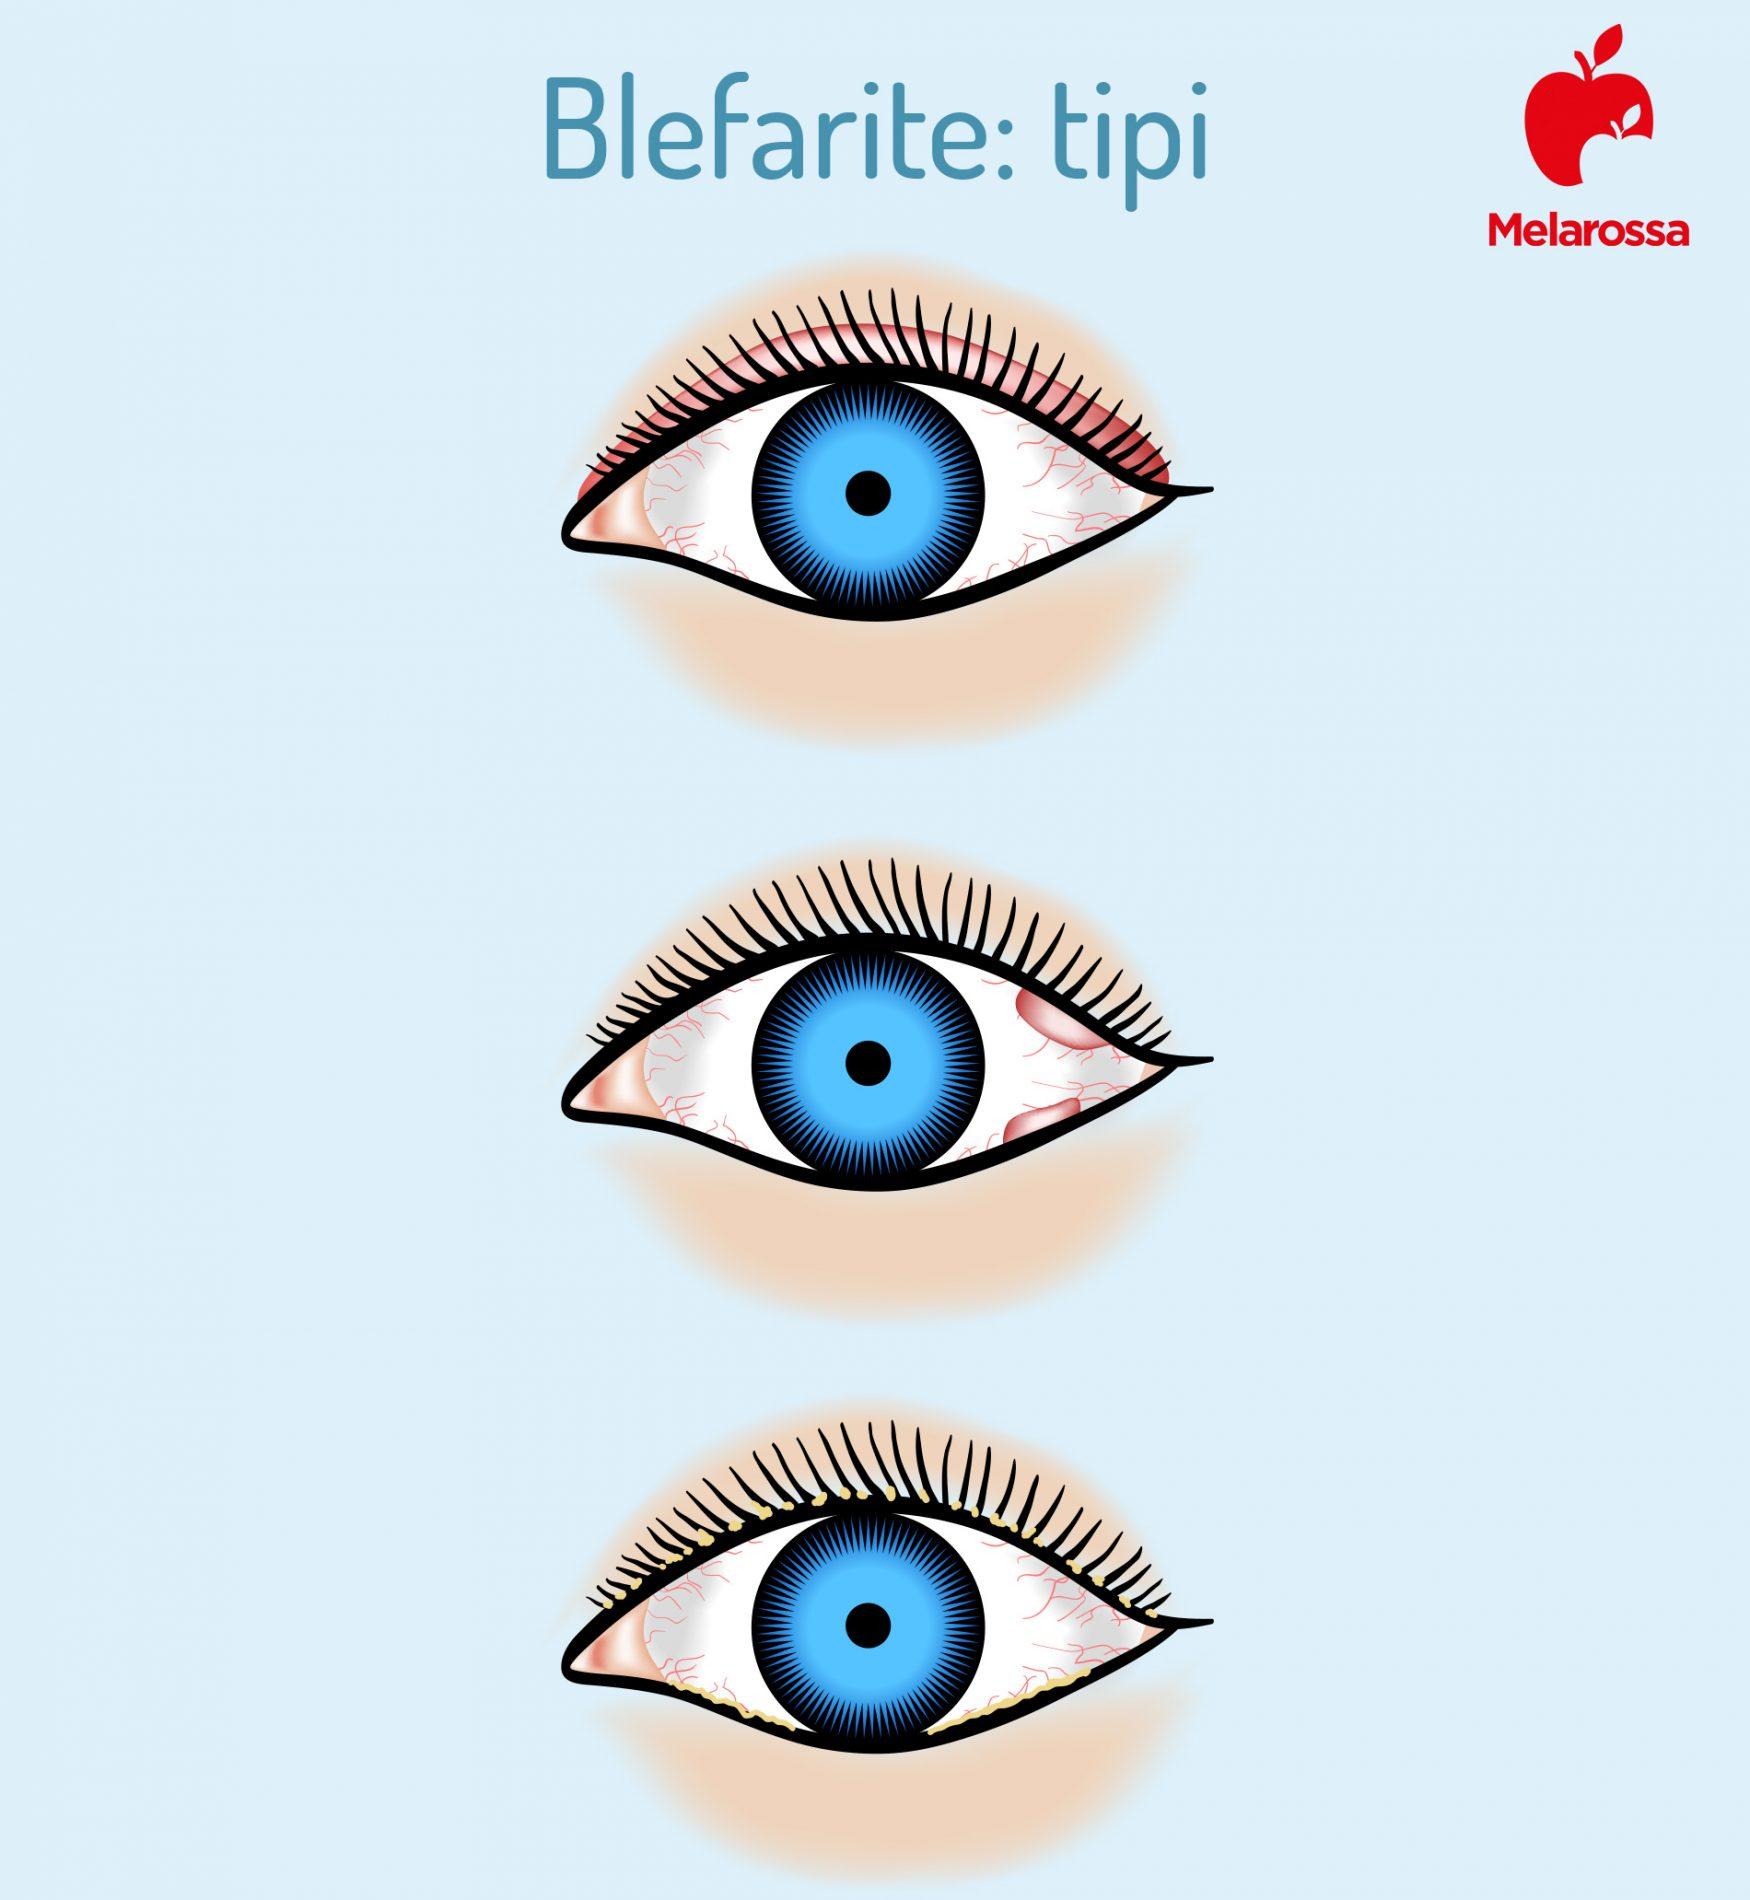 tipi di blefarite